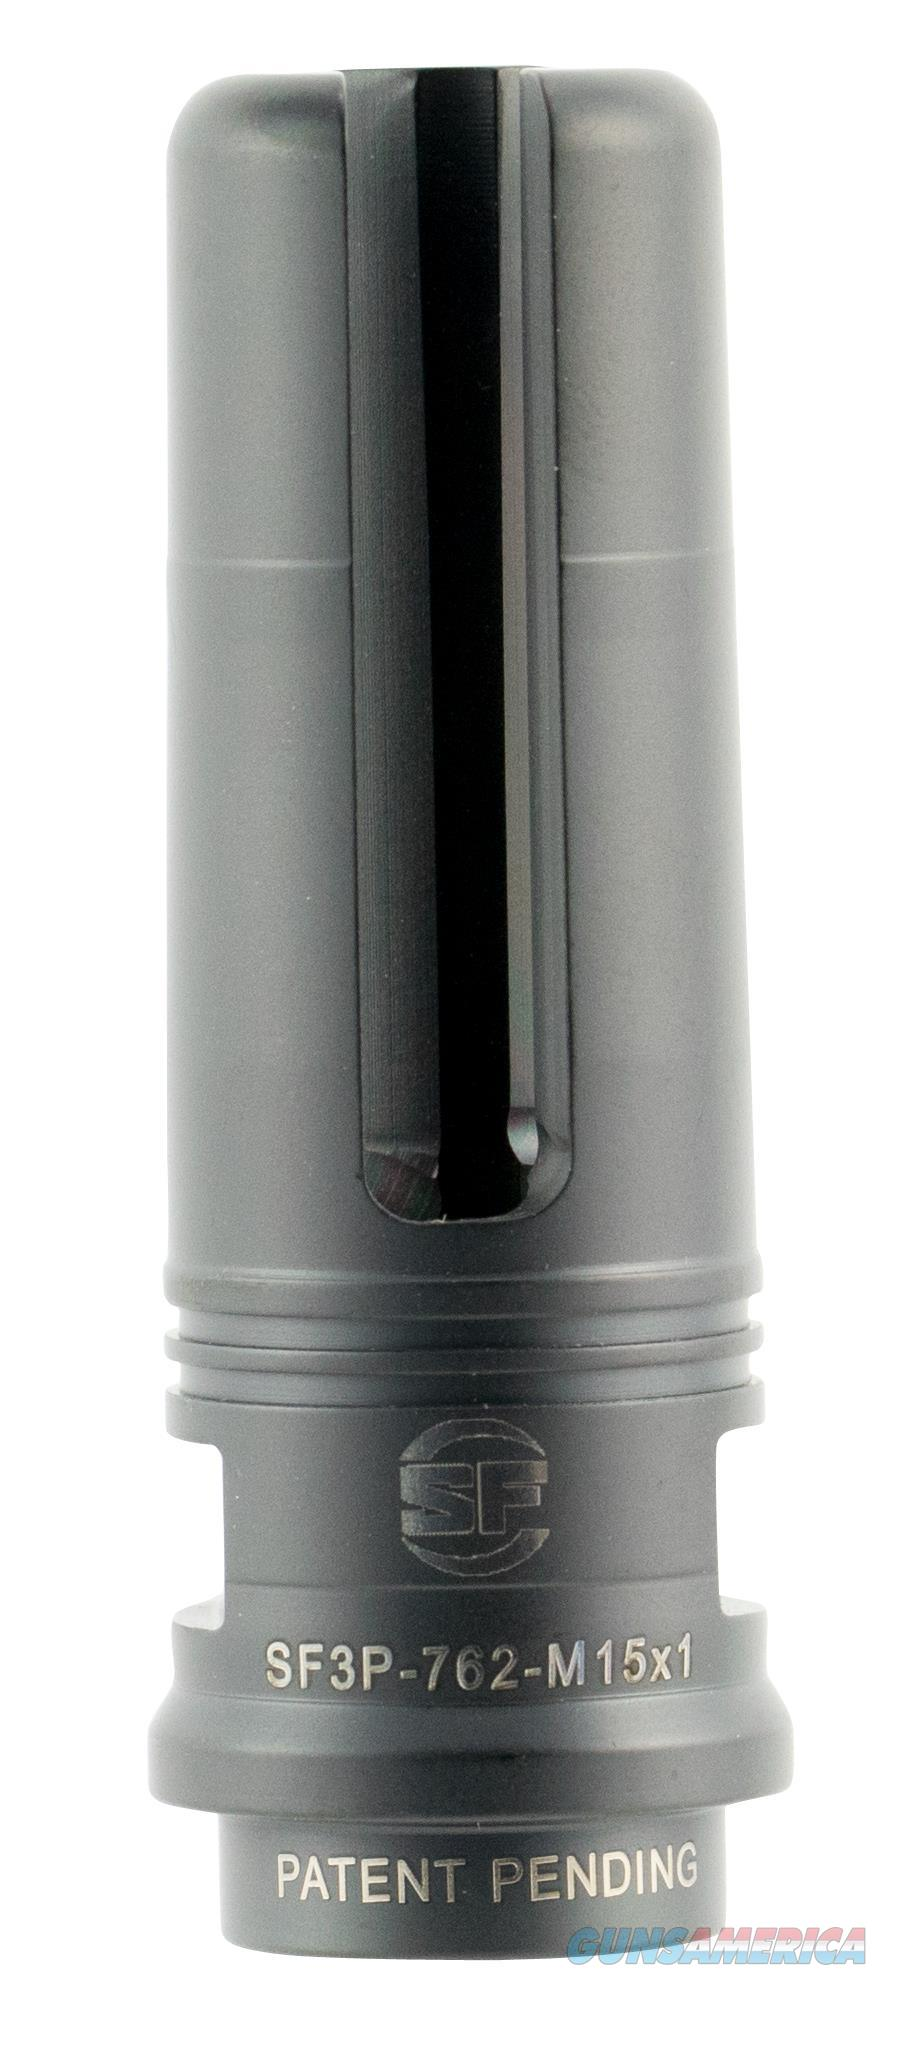 "Surefire Sf3p762 Suppressor Adapter Flash Hider Hk417 7.62 51Mm Stainless Steel 2.8"" SF3P762  Non-Guns > Gun Parts > Misc > Rifles"